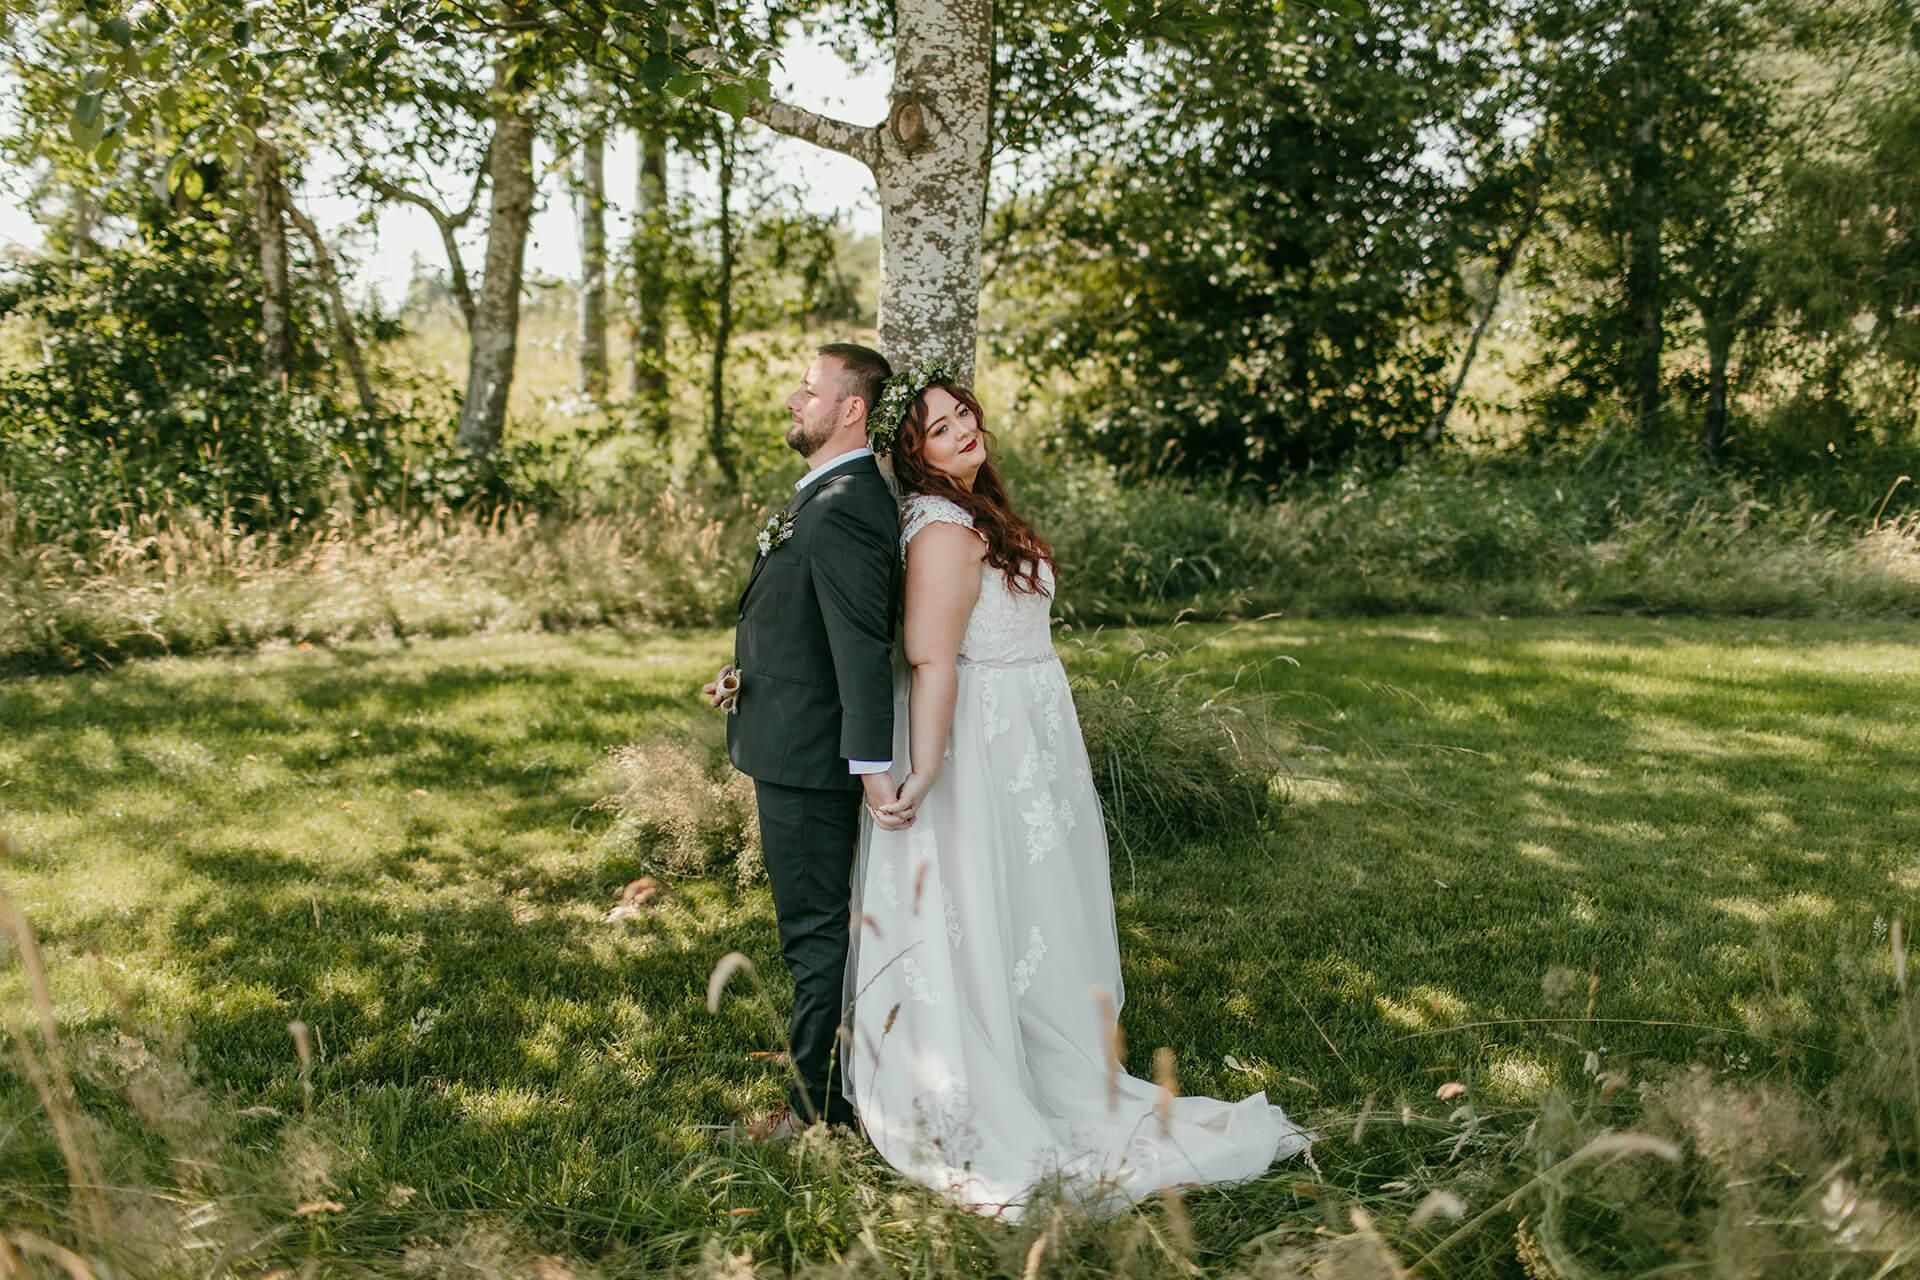 Bride and groom first look at Mount Peak Farm